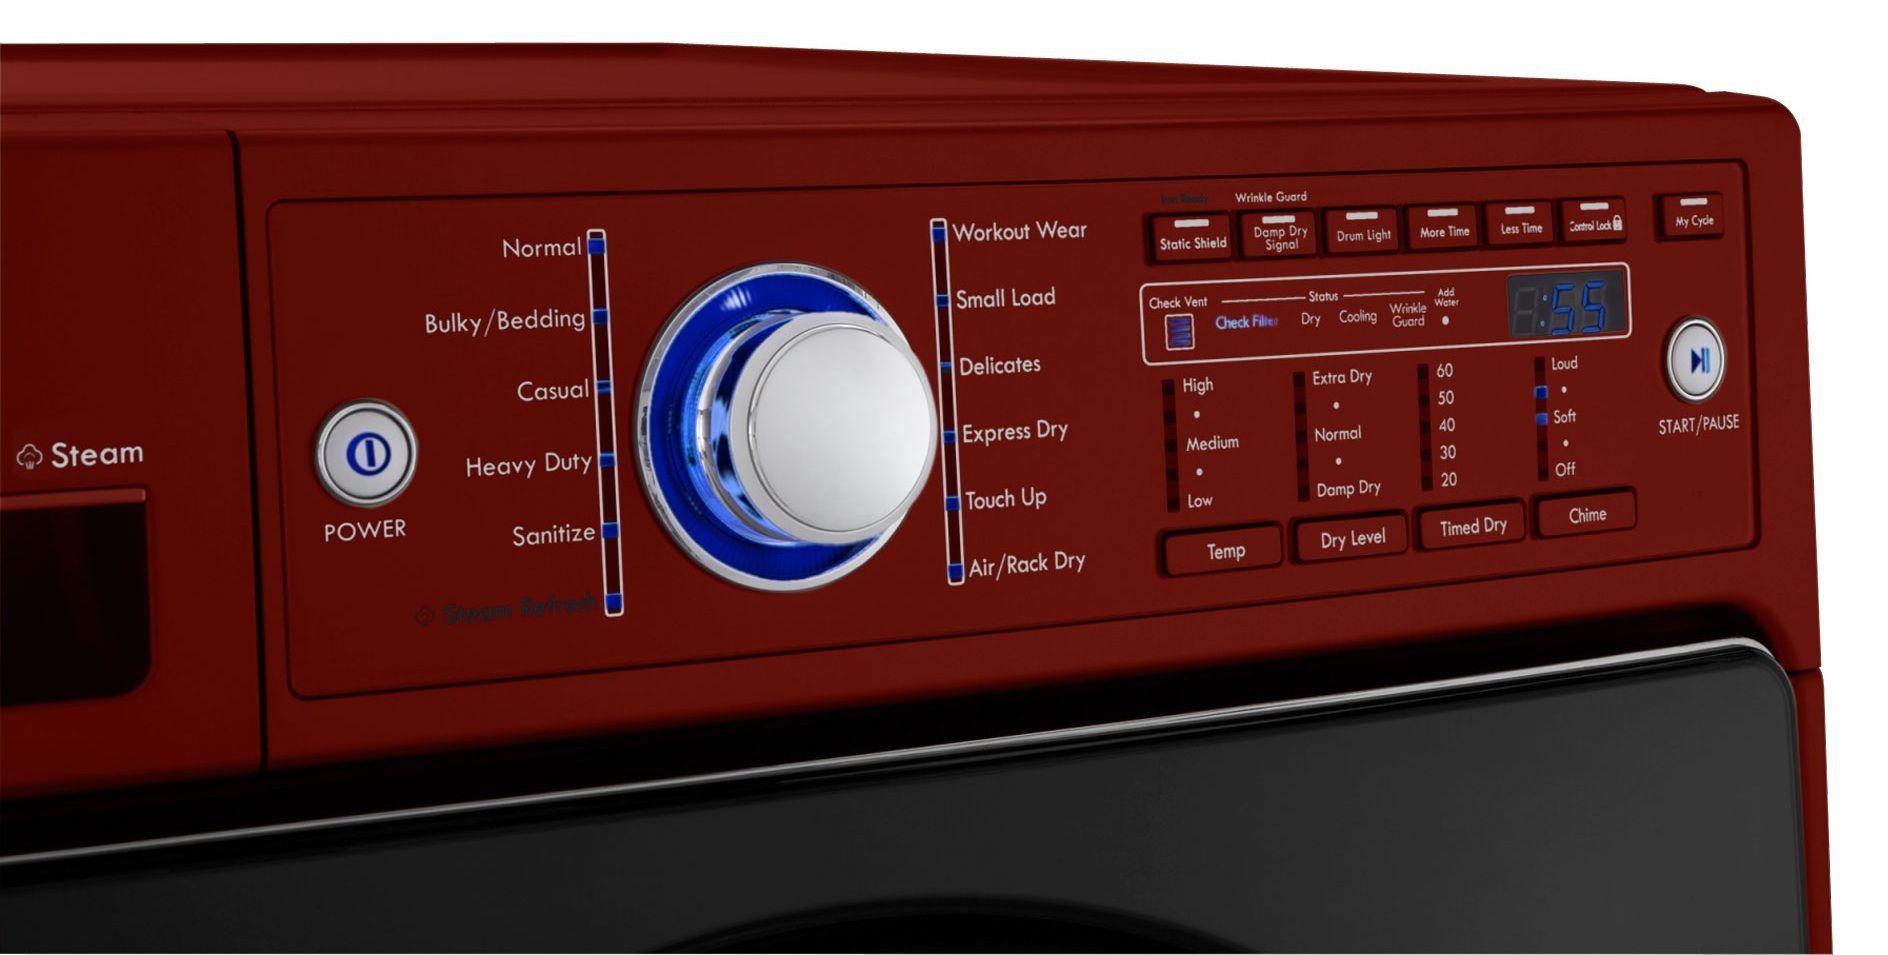 Kenmore Elite 7.4 cu. ft. Steam Dryer - Chili Pepper